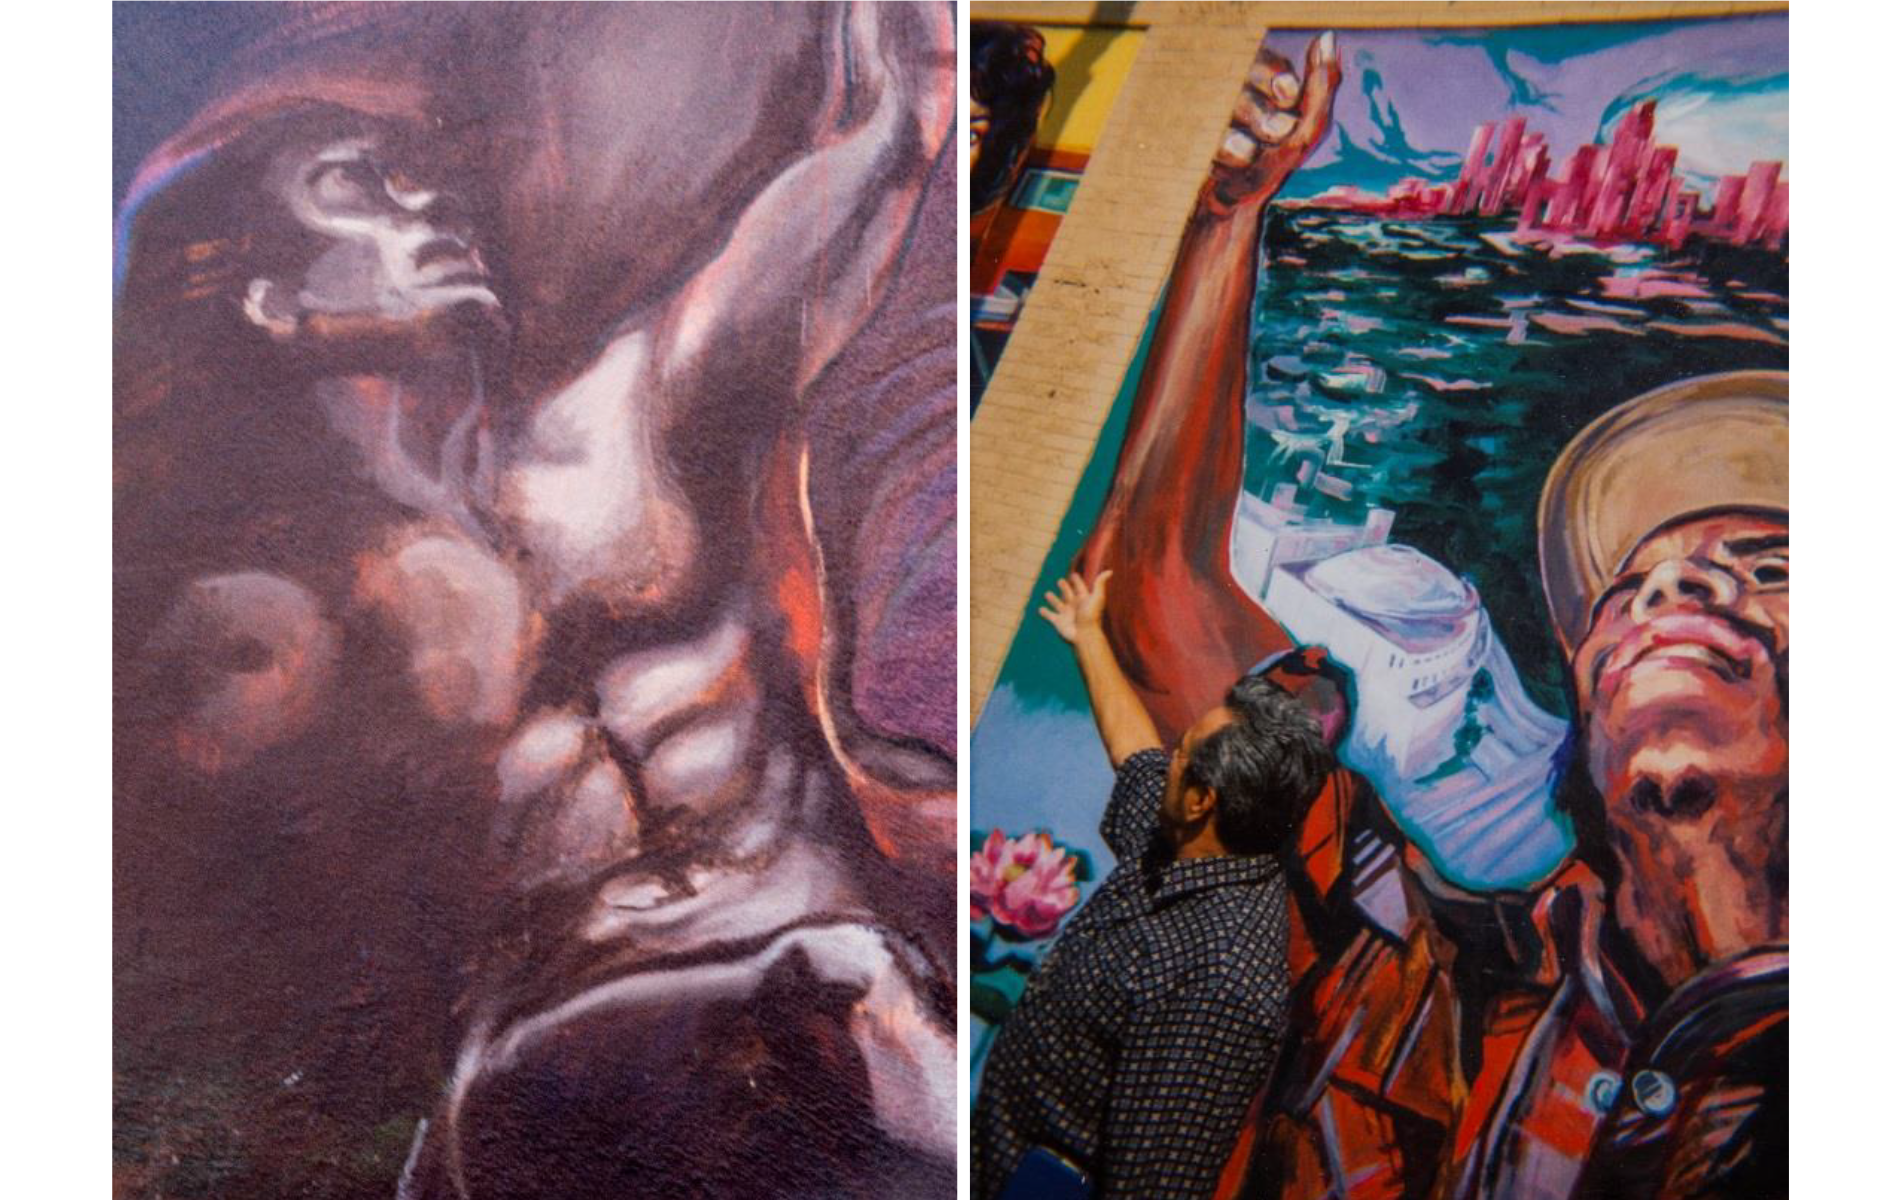 <h1>Mural details, <em>Resurrection of the Green Planet</em> (left) and <em>El Nuevo Mundo: Homage to the Worker</em> (right)</h1>